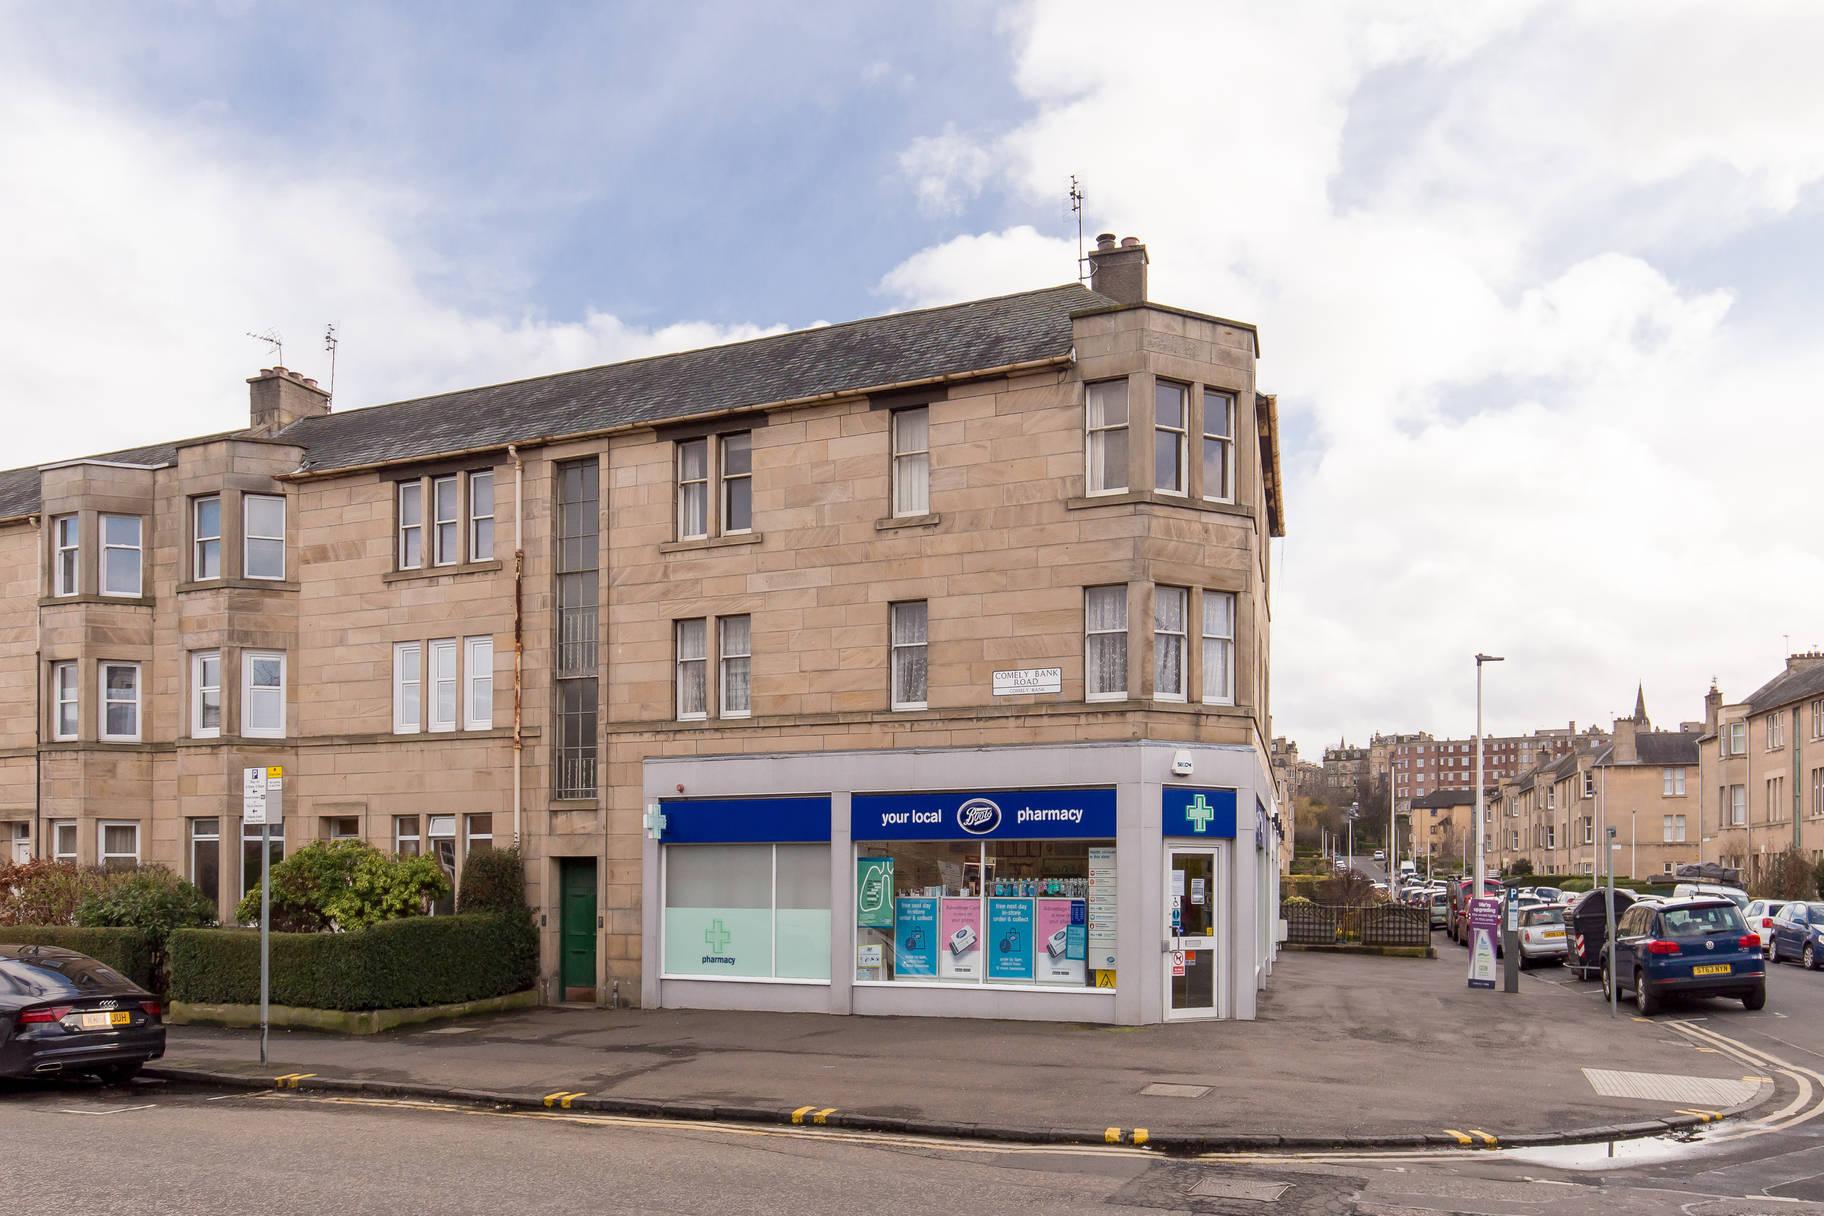 147 (1F1) Comely Bank Road, Edinburgh, EH4 1BH